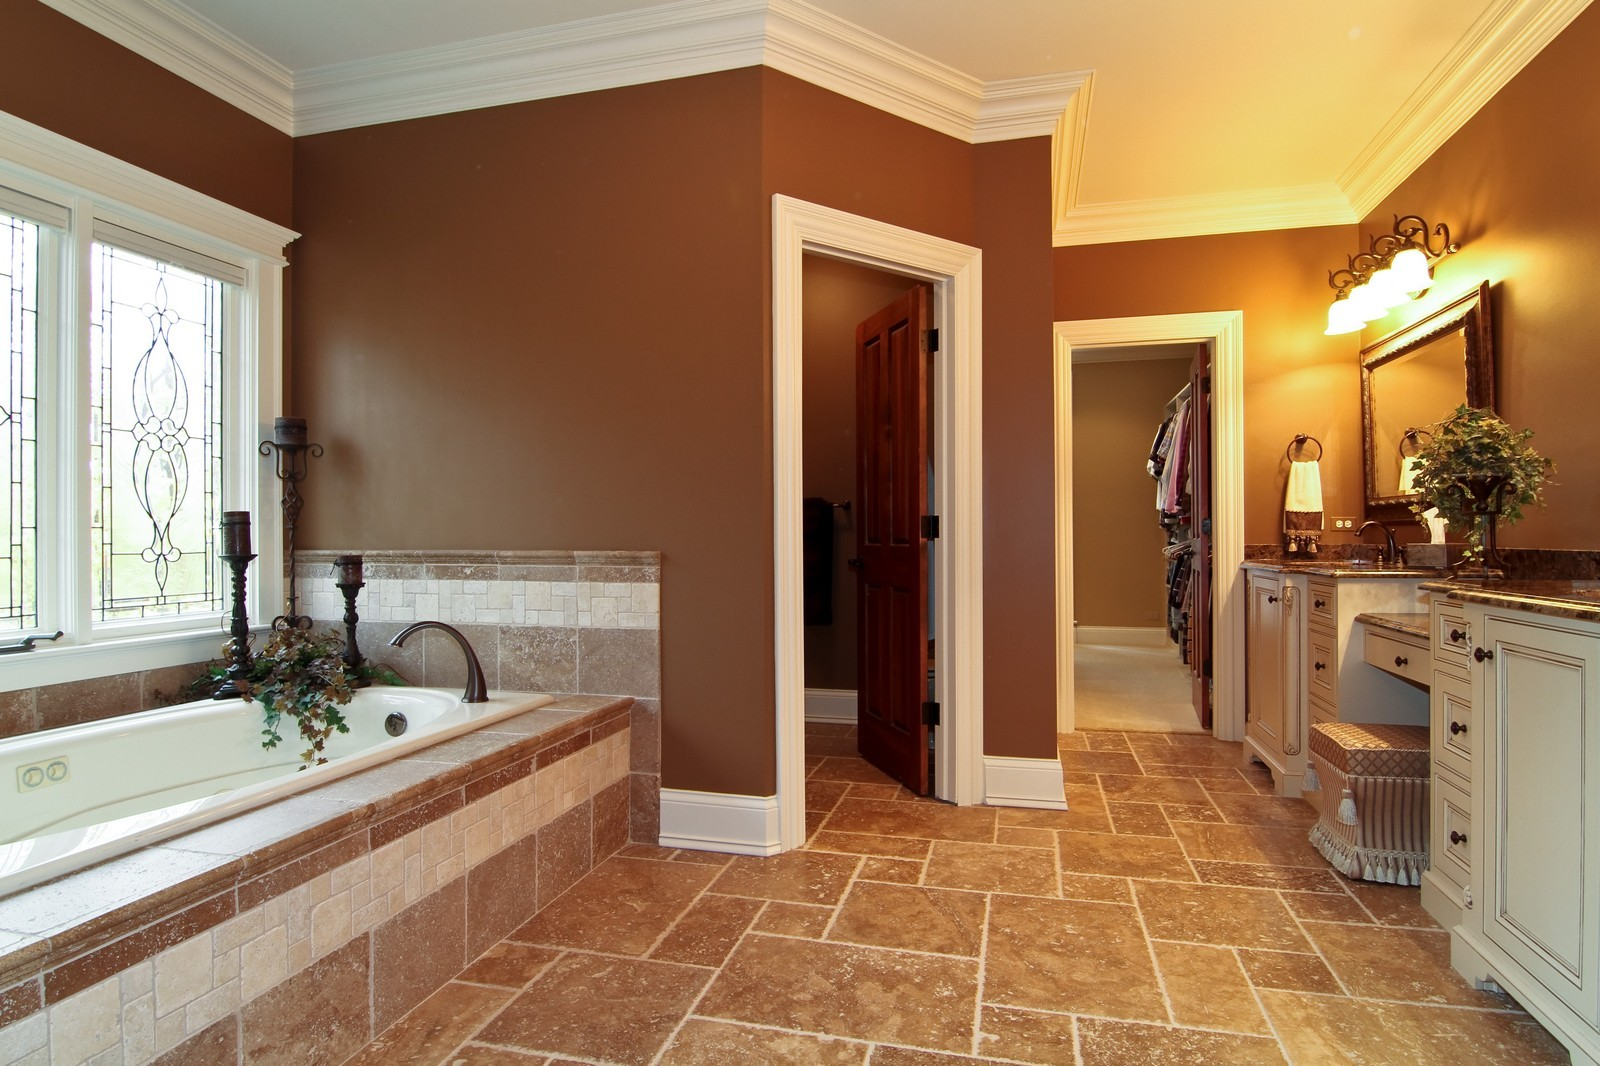 Real Estate Photography - 810 Fox Glen Drive, St. Charles, IL, 60174 - Master Bathroom